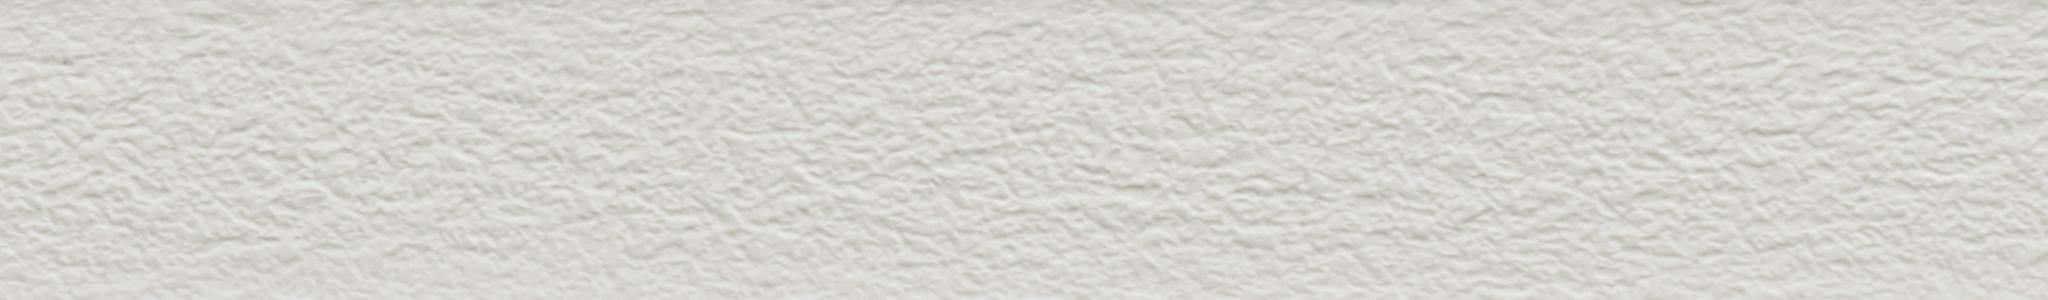 HU 171191 ABS hrana šedá Kongo perla XA